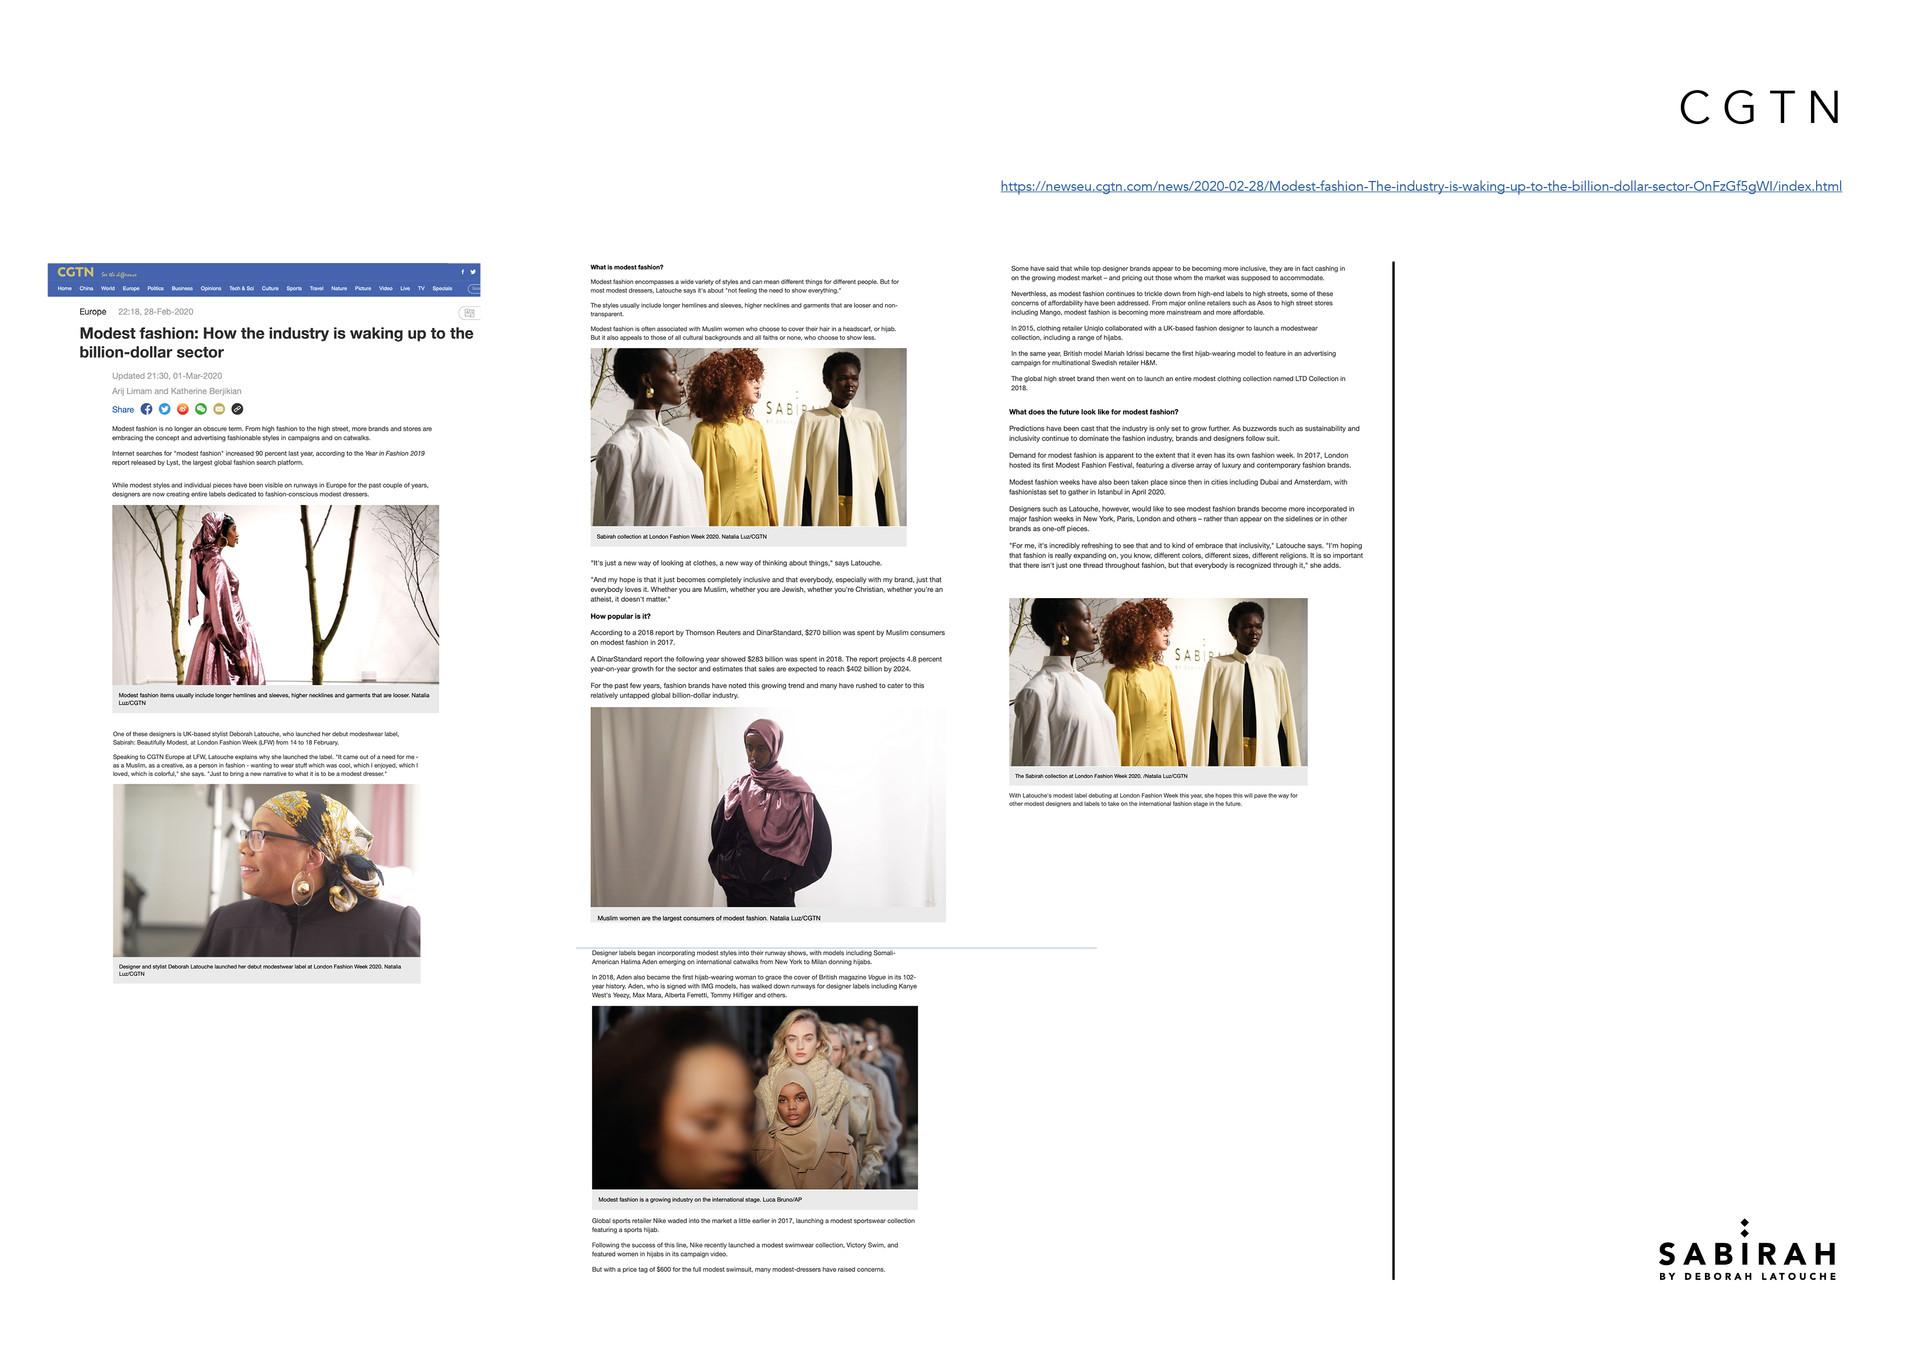 Sabirah_press book4.jpg